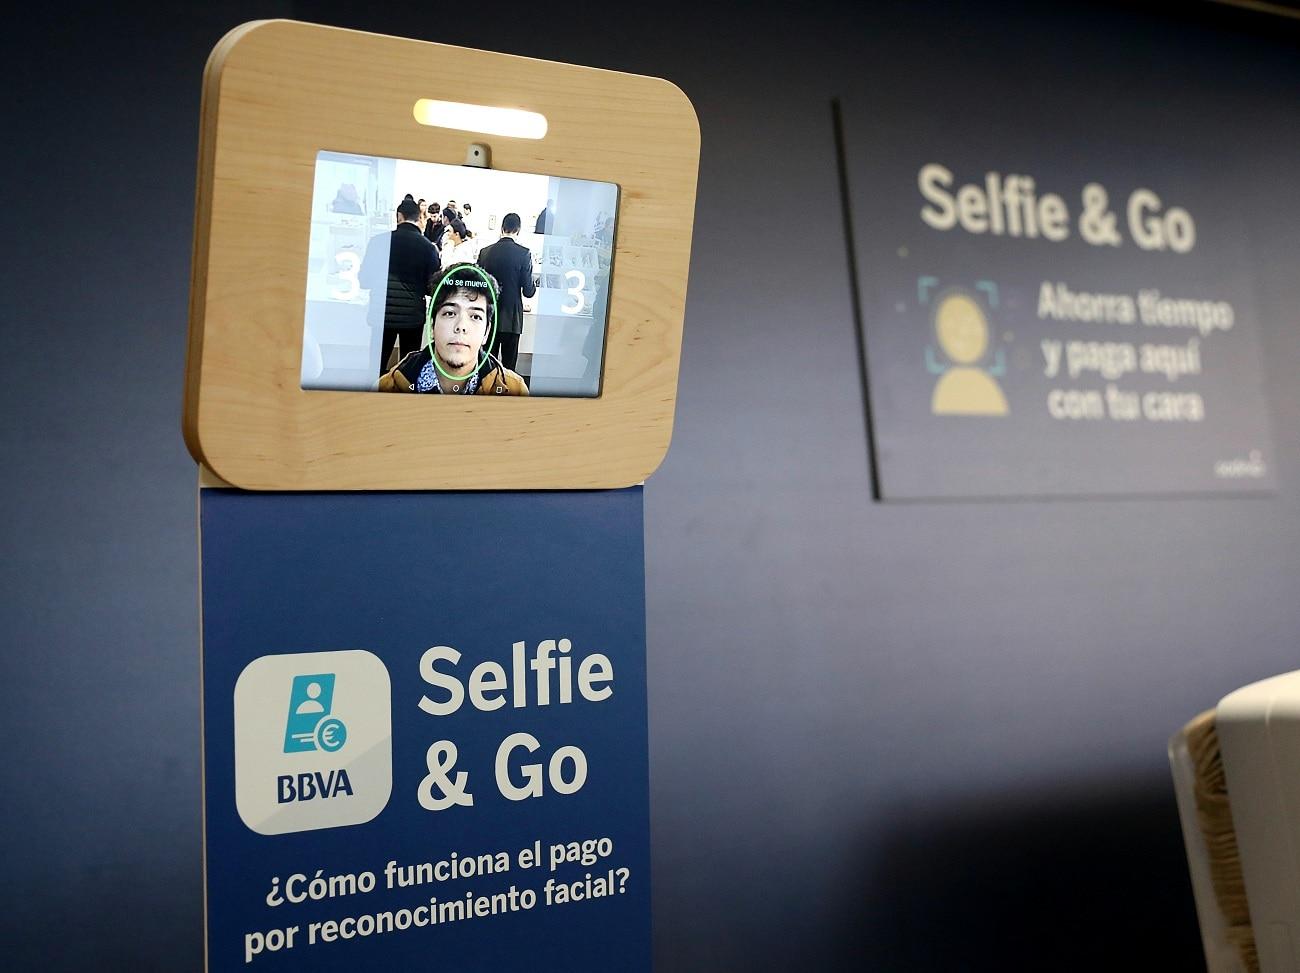 selfie-go-bbva-julian